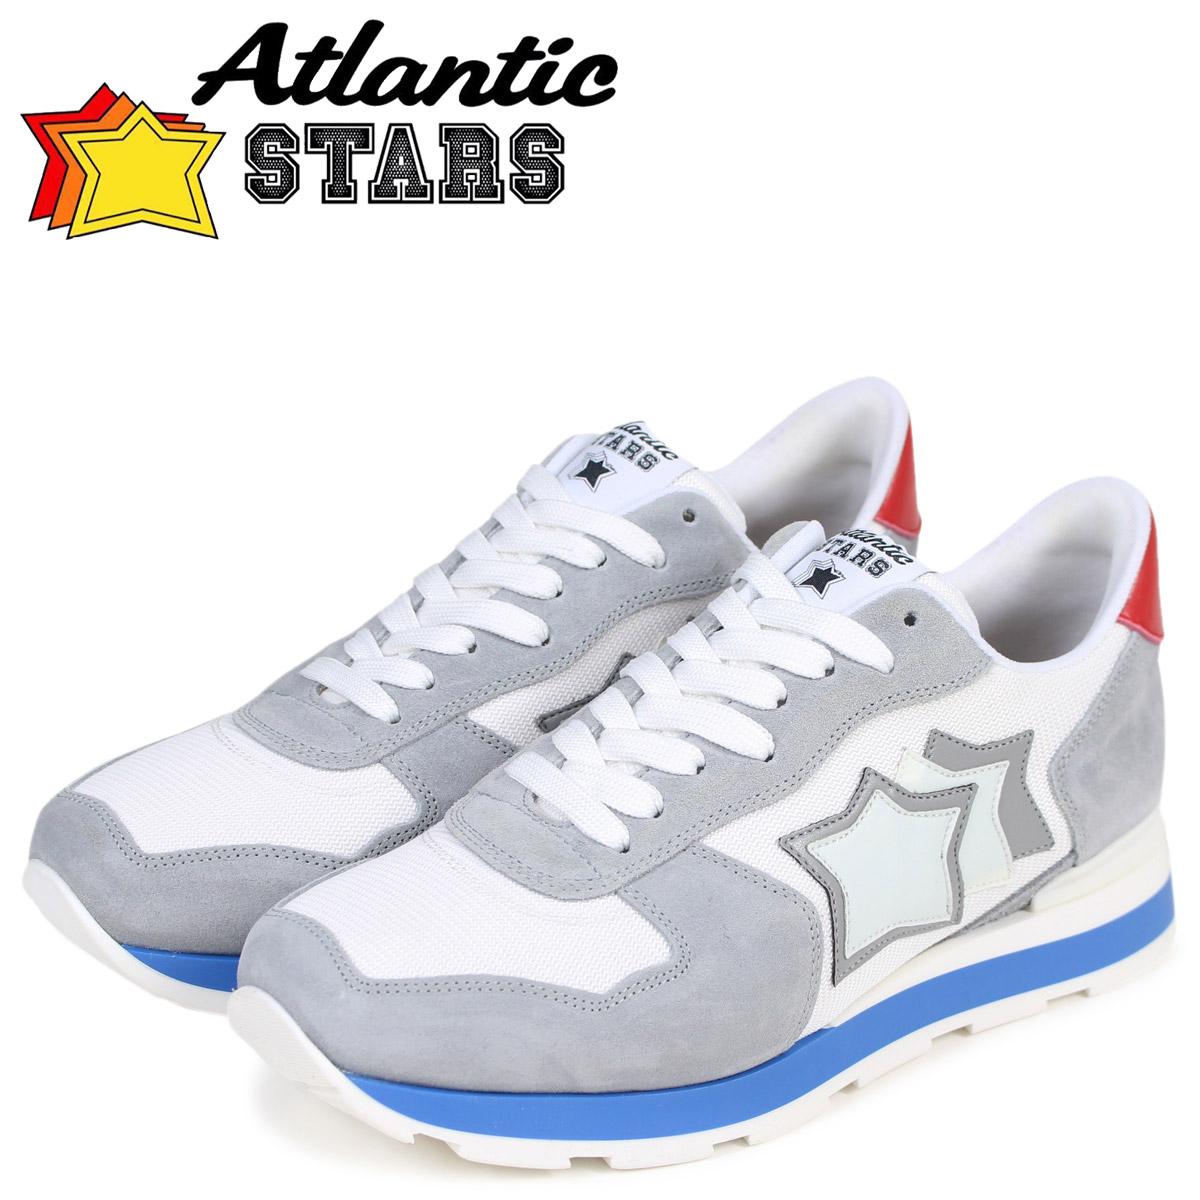 Atlantic STARS メンズ スニーカー アトランティックスターズ アンタレス ANTARES BAB-34B ライトグレー